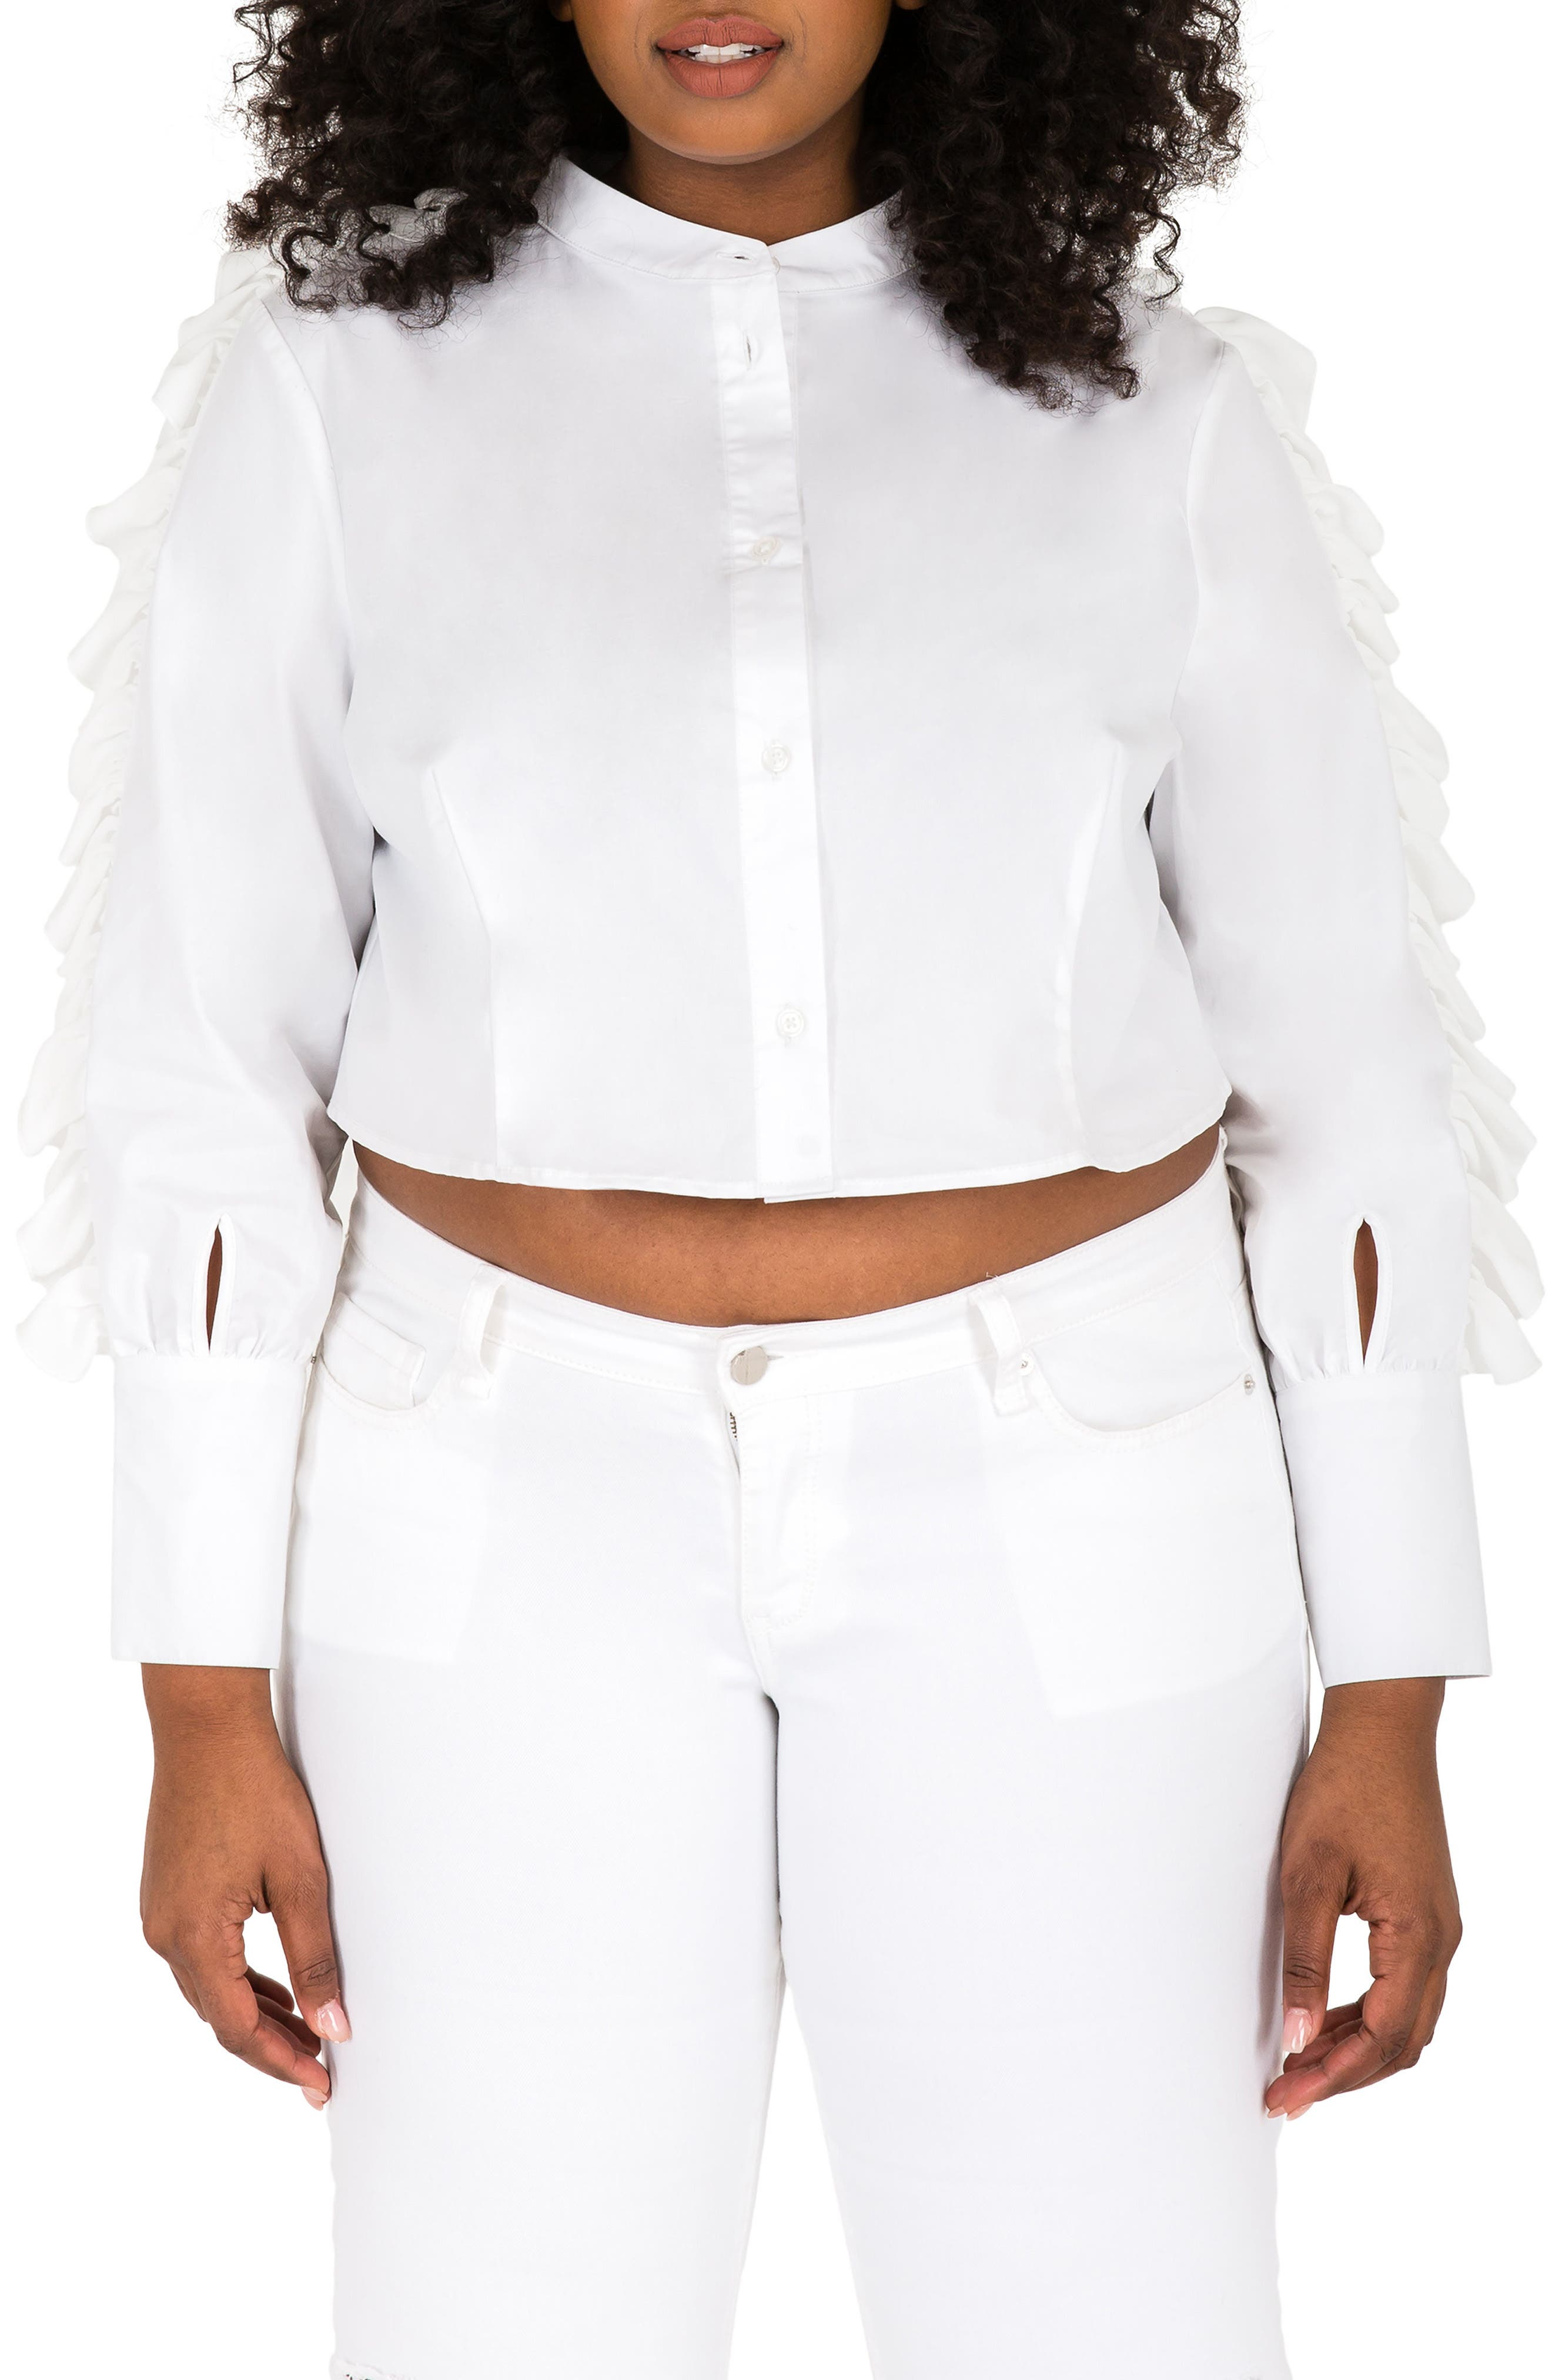 Mayasia Ruffle Sleeve Crop Shirt,                         Main,                         color, White